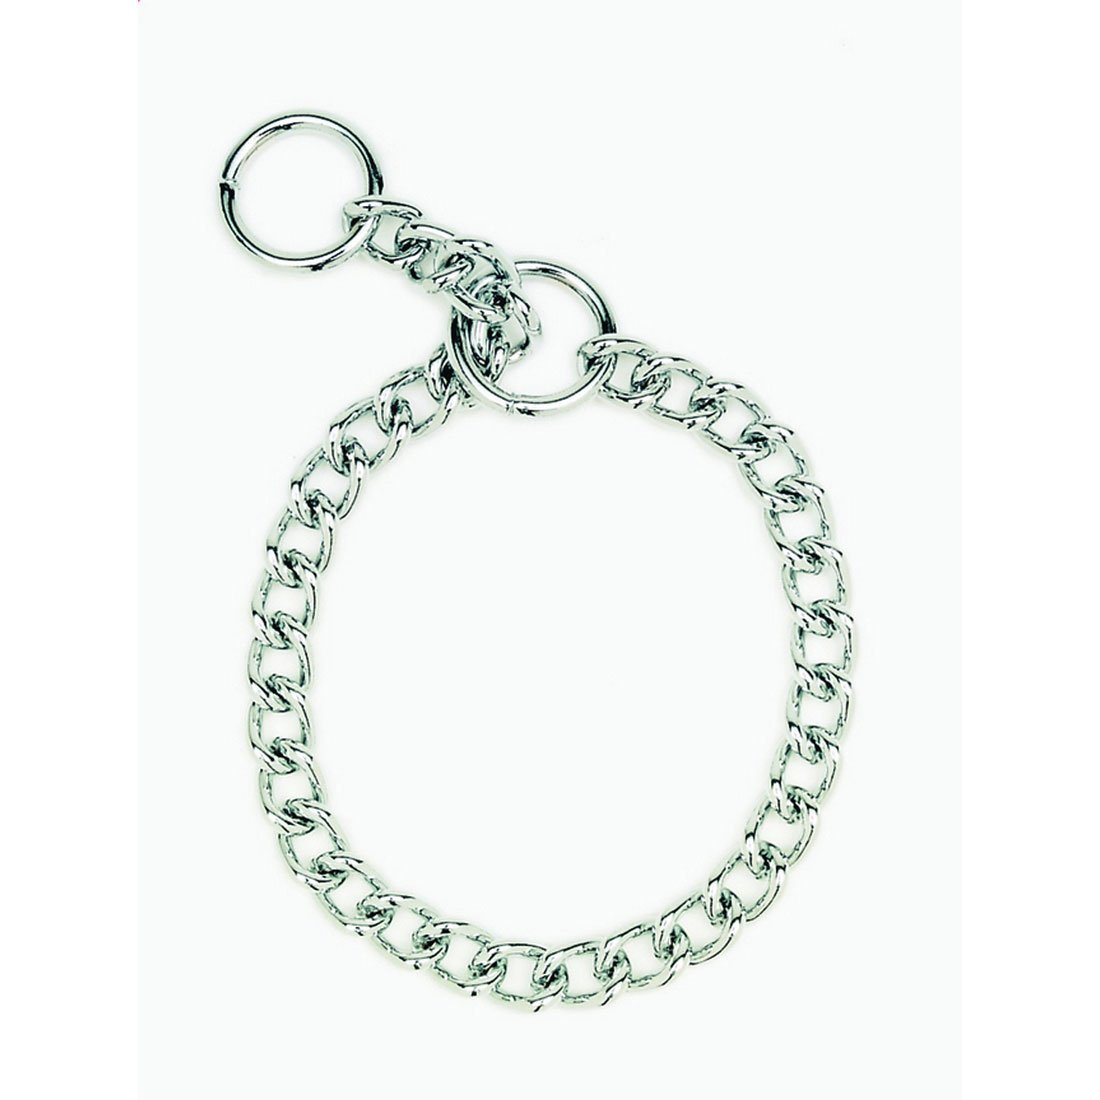 Coastal Pet Products Herm. Sprenger Dog Chain Training Collar 4.0mm Silver - $15.99